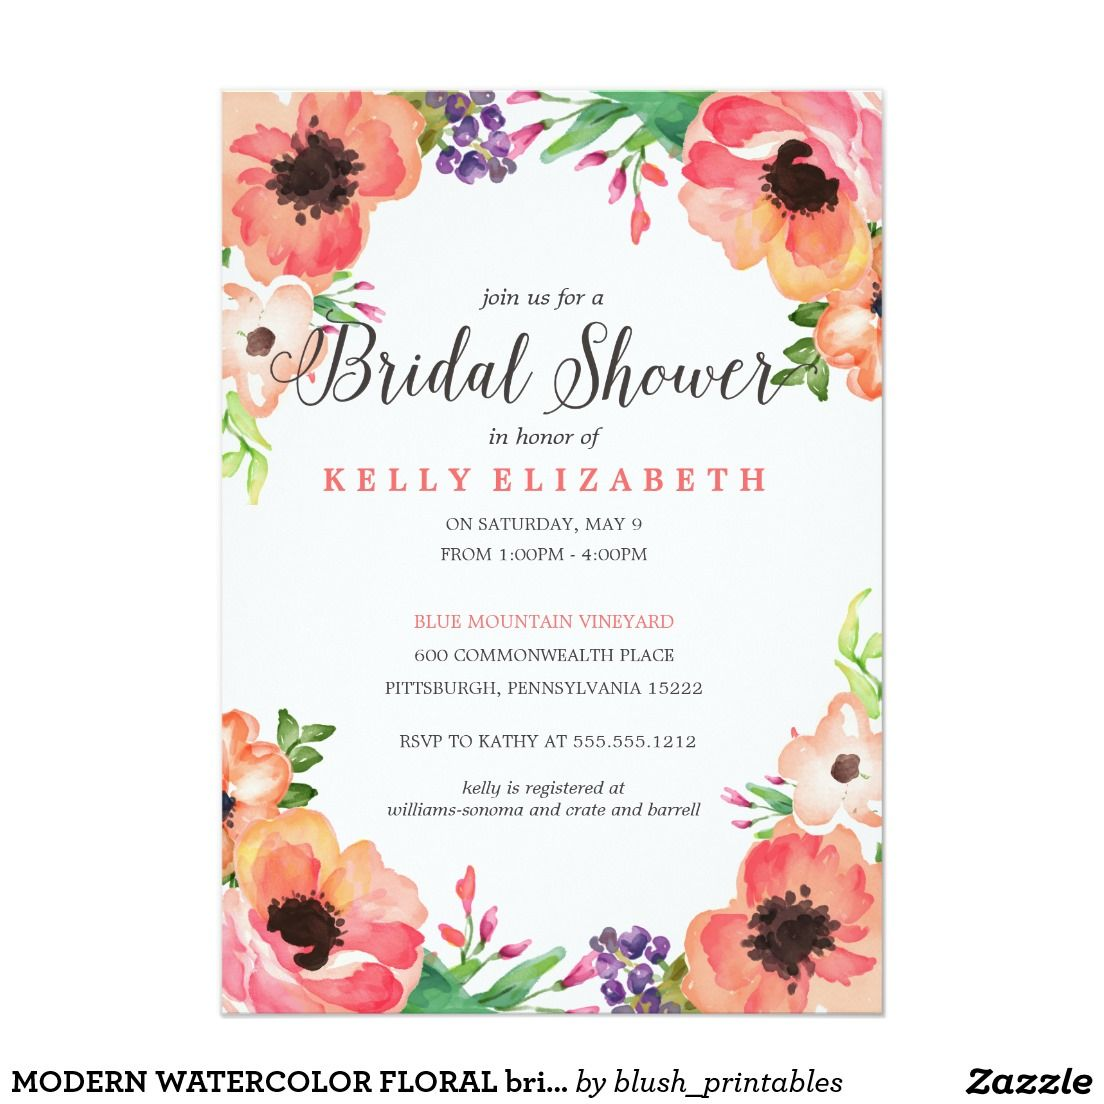 Modern Watercolor Floral Bridal Shower Invitation Shower